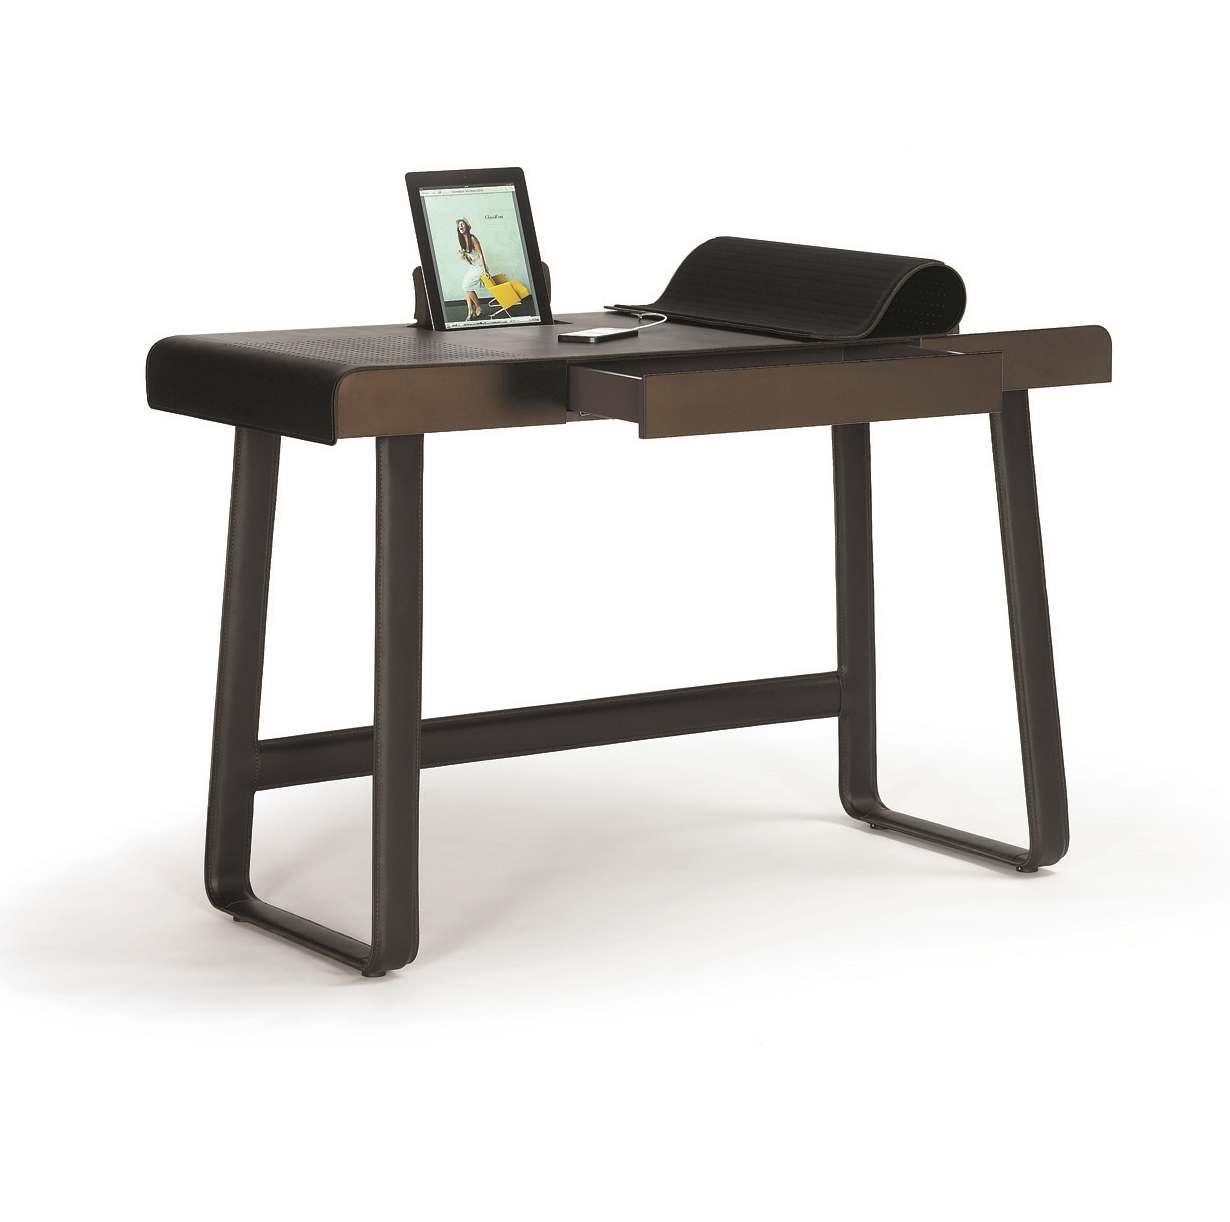 Pegasus Home Desk Schreibtisch ClassiCon